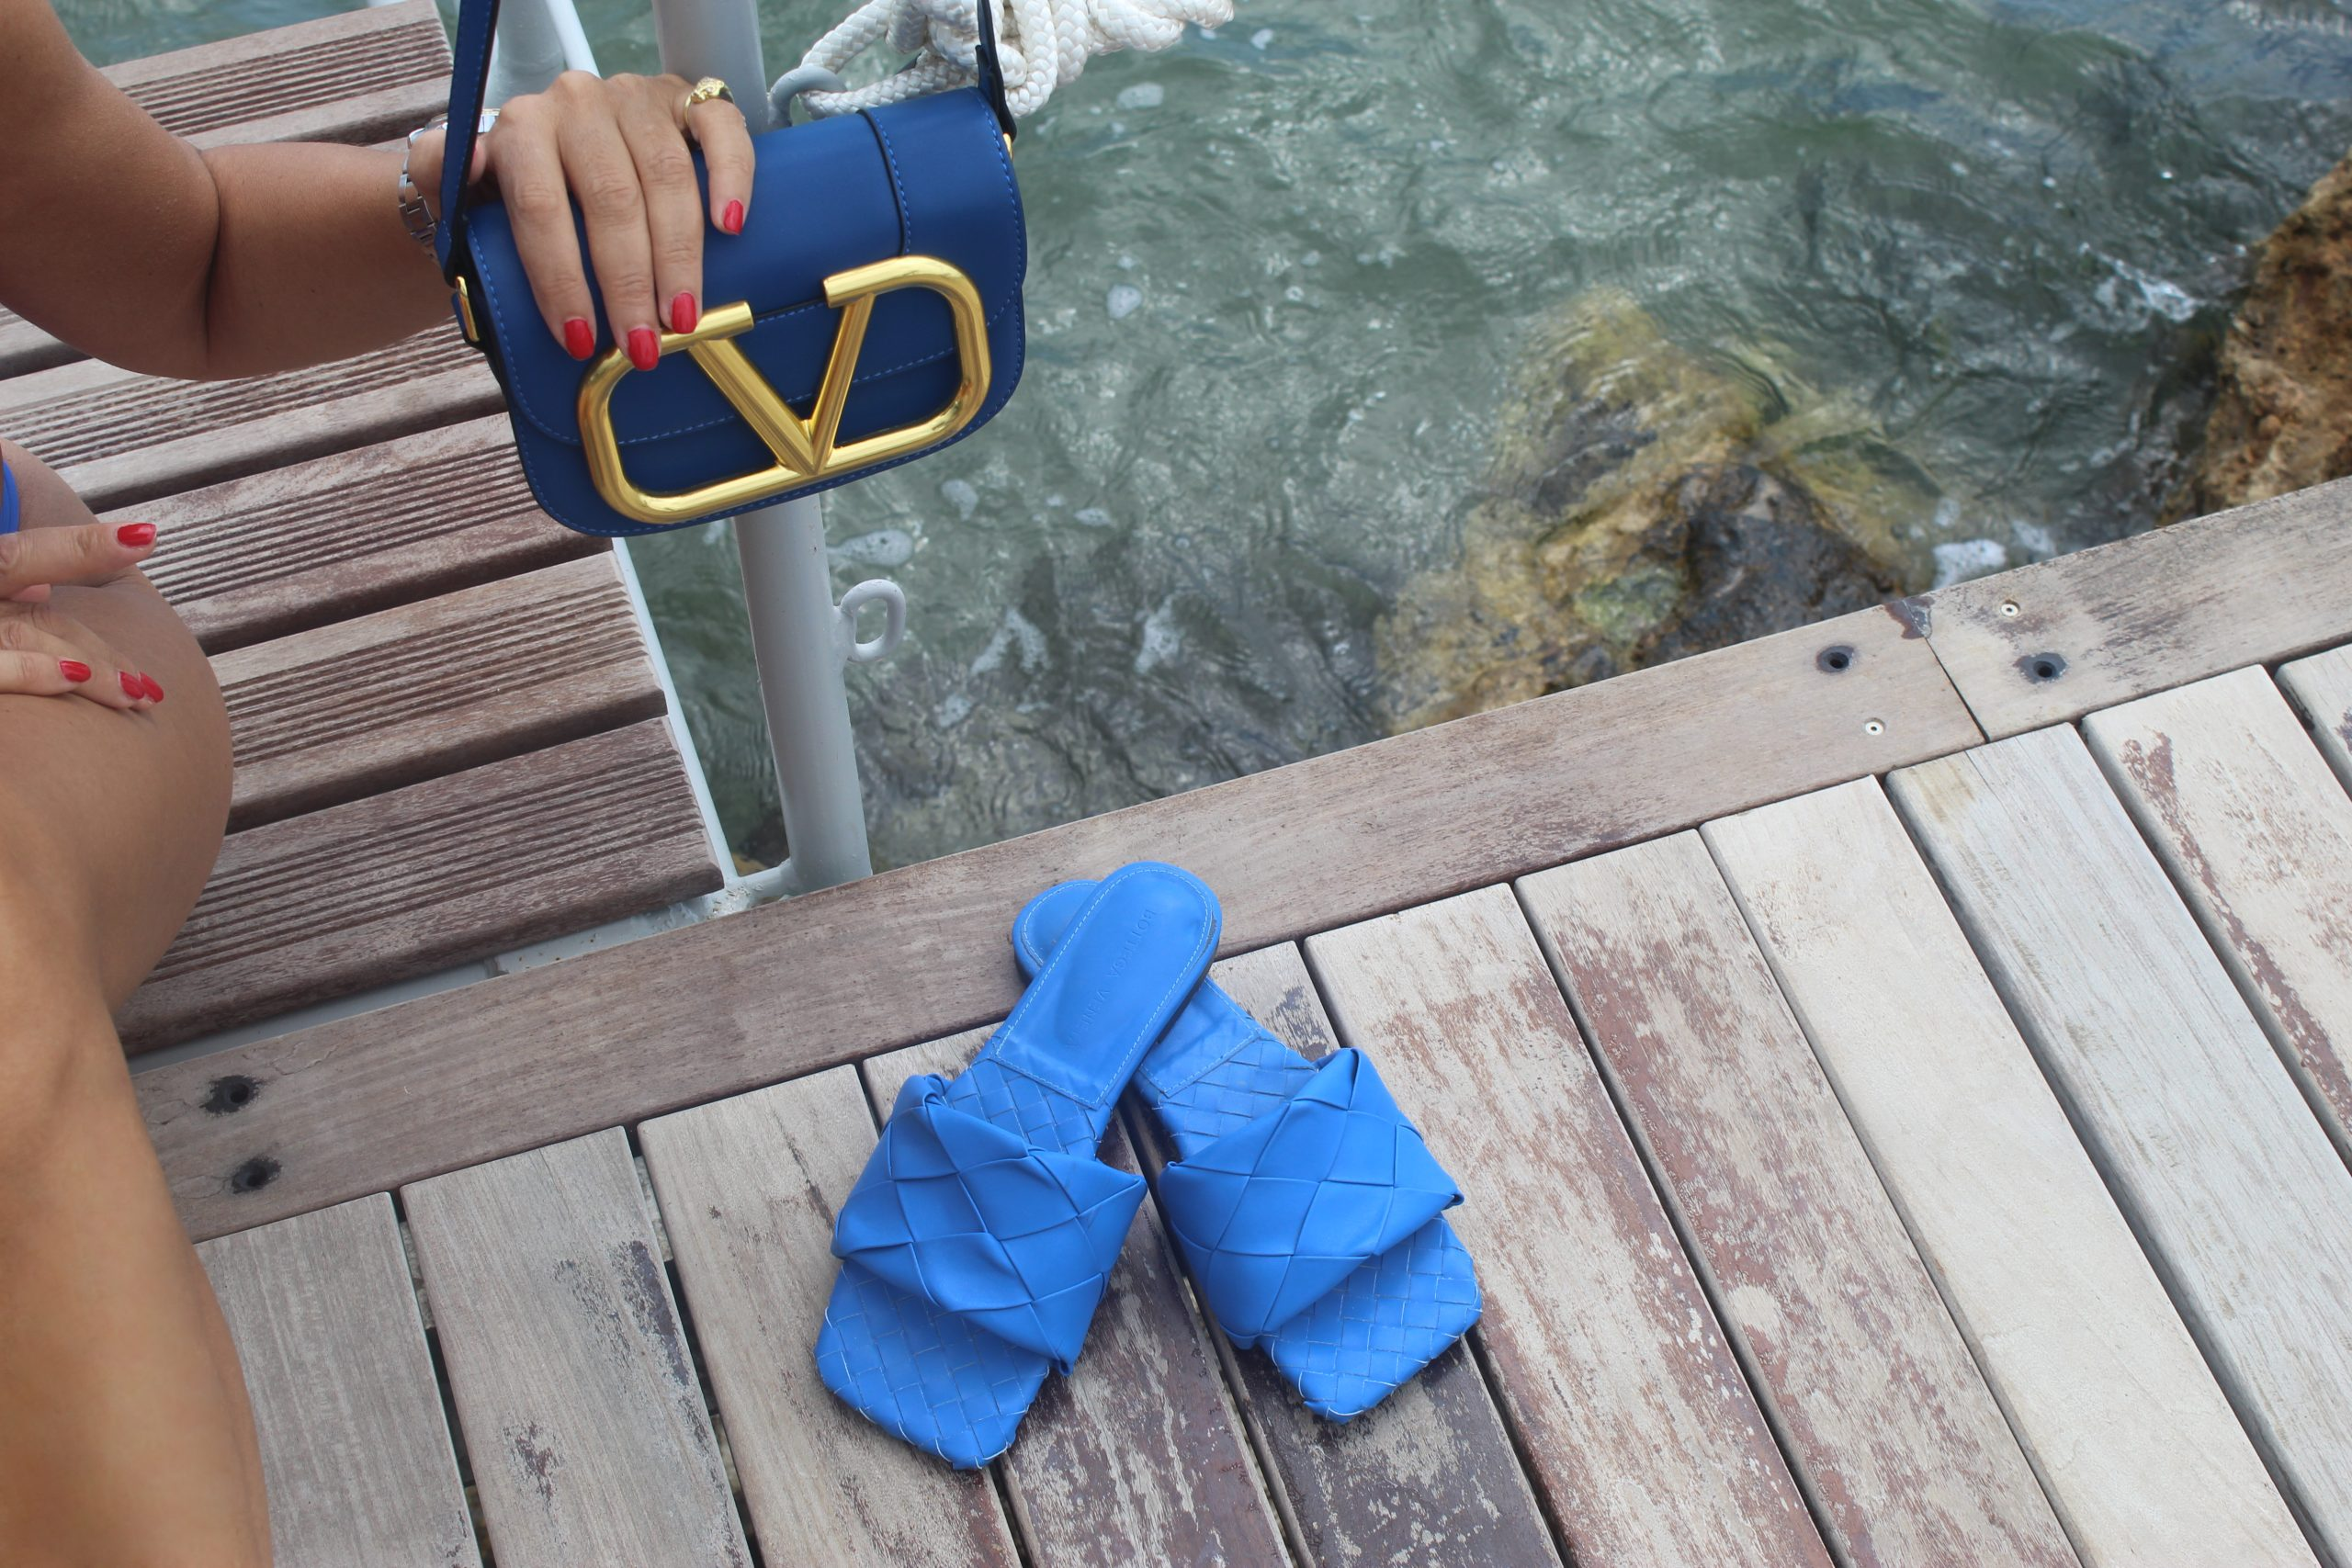 endless summer beachwear gucci accessories bottega veneta lookbook travel blogger inspo Paola Lauretano